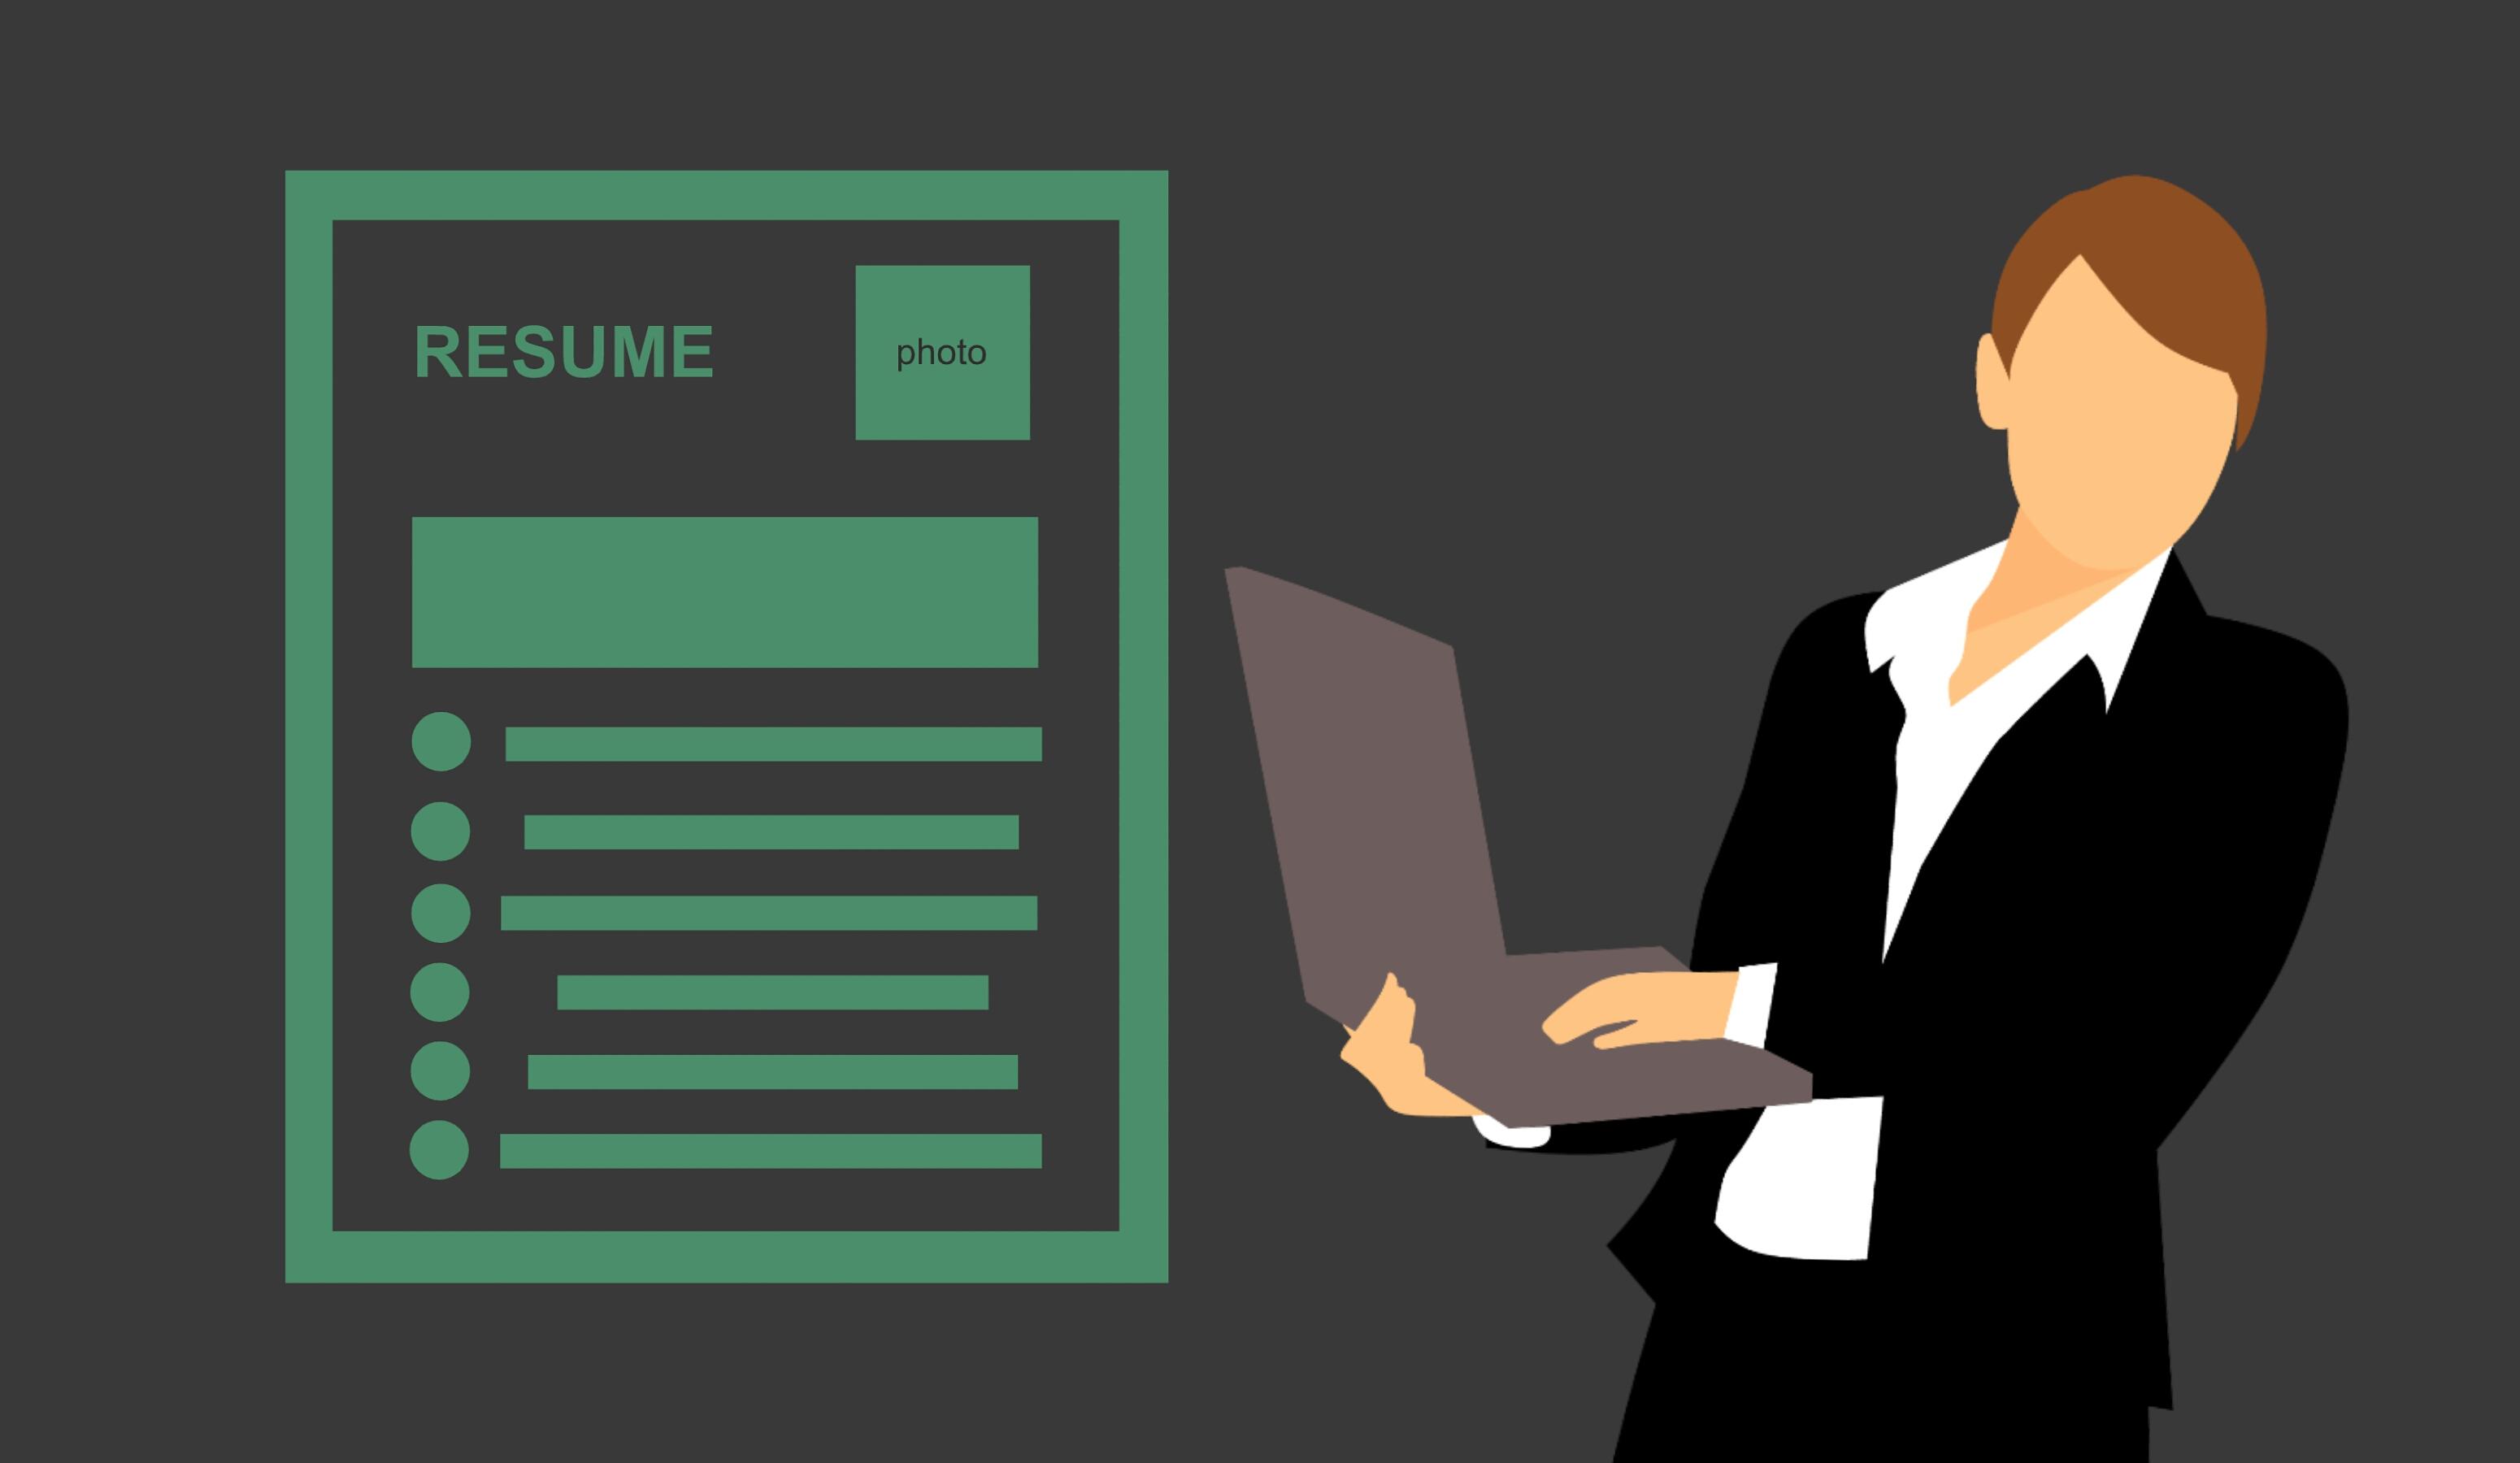 career-resume-hiring-job-interview-sonaaf-recruitment-1437771-pxhere.com